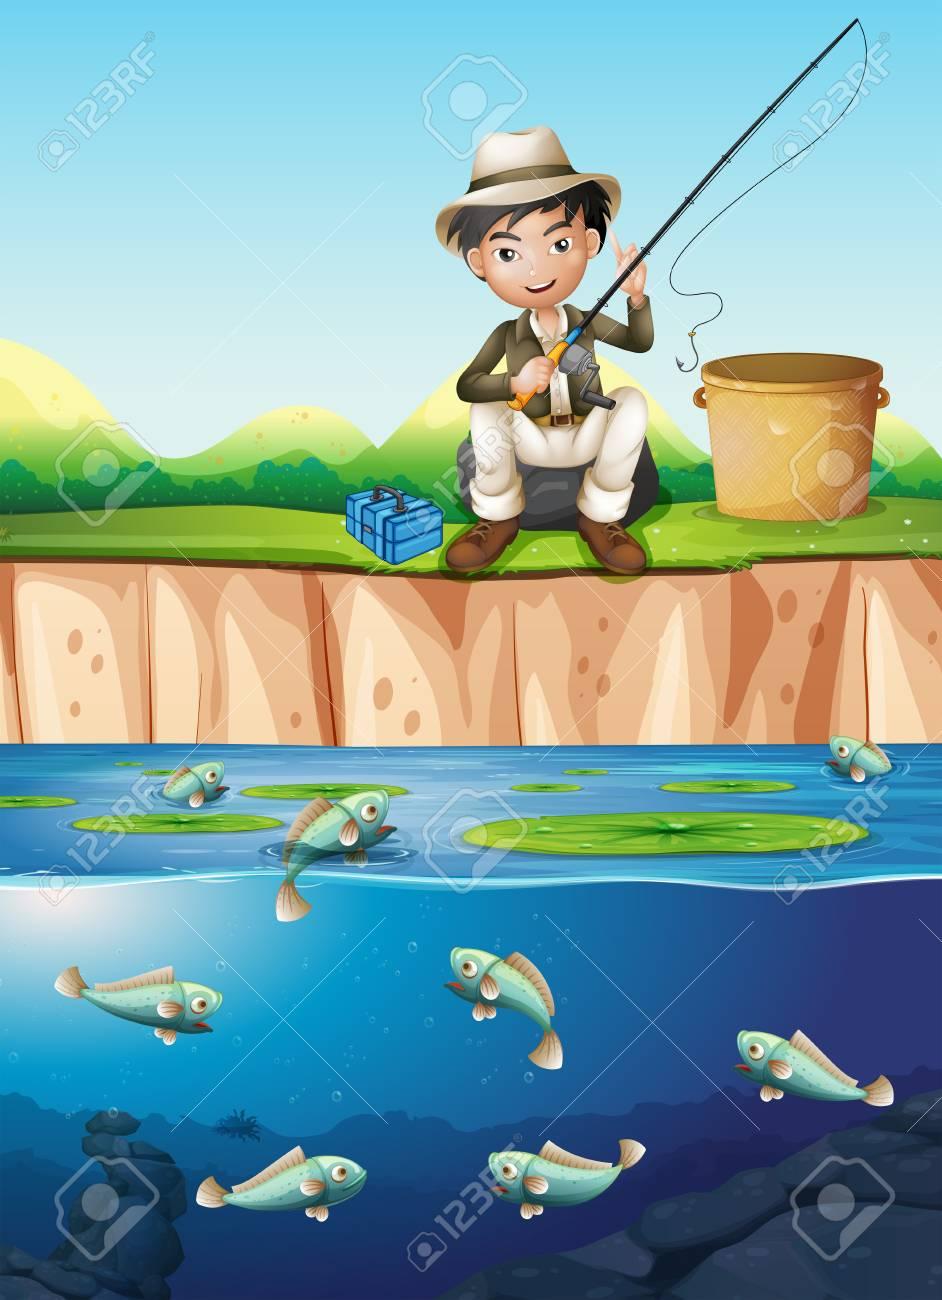 Fish Pond Cartoon Images, Stock Photos & Vectors | Shutterstock